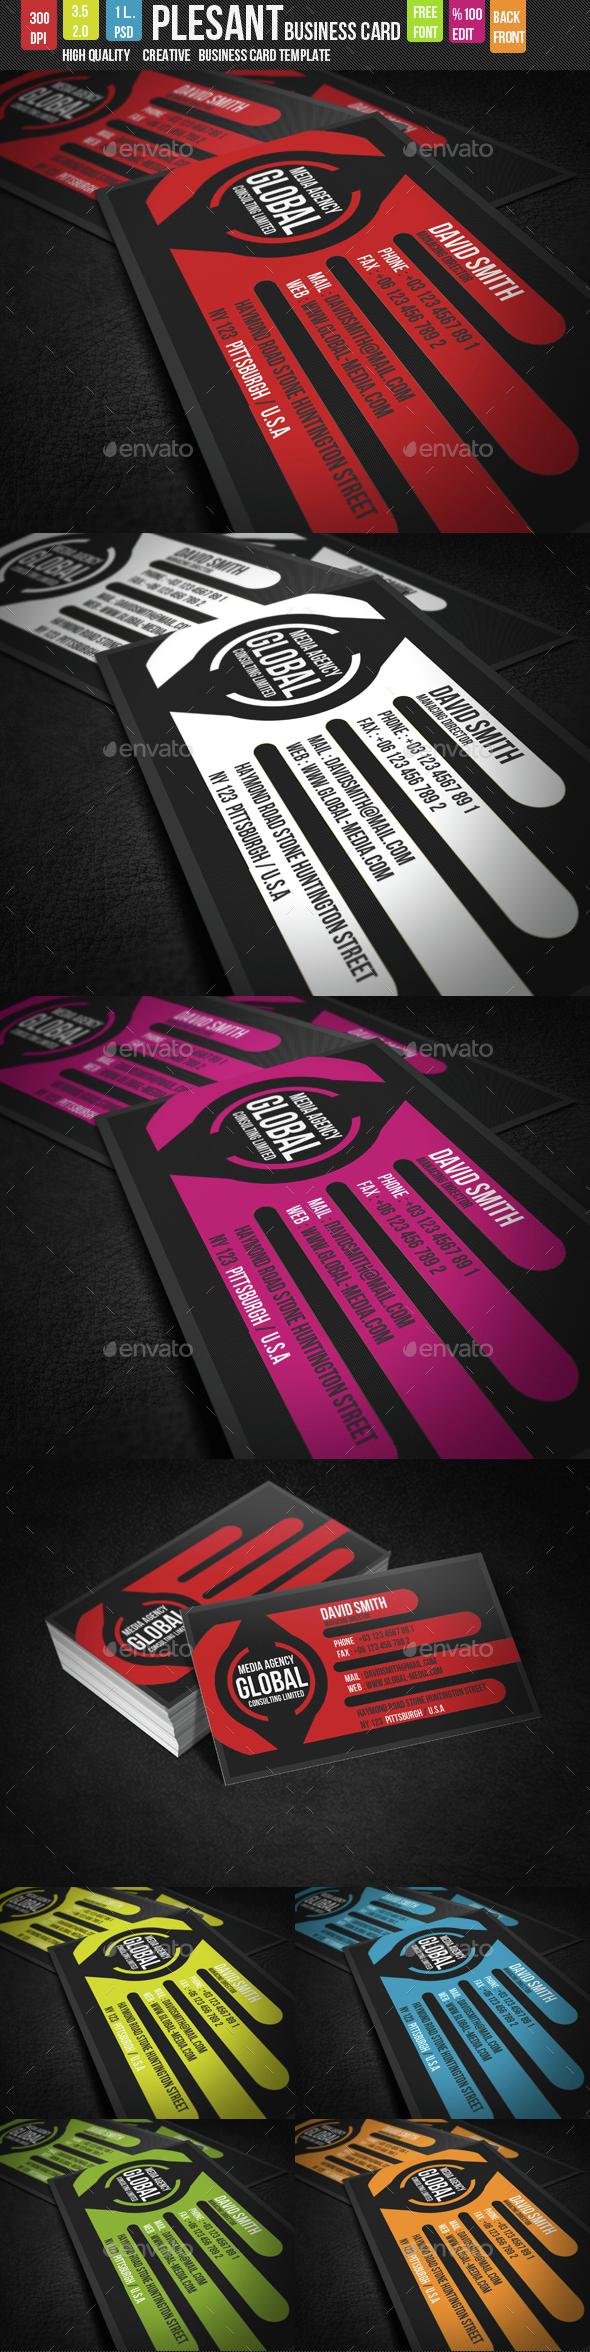 Pleasant Creative Business Card - Creative Business Cards